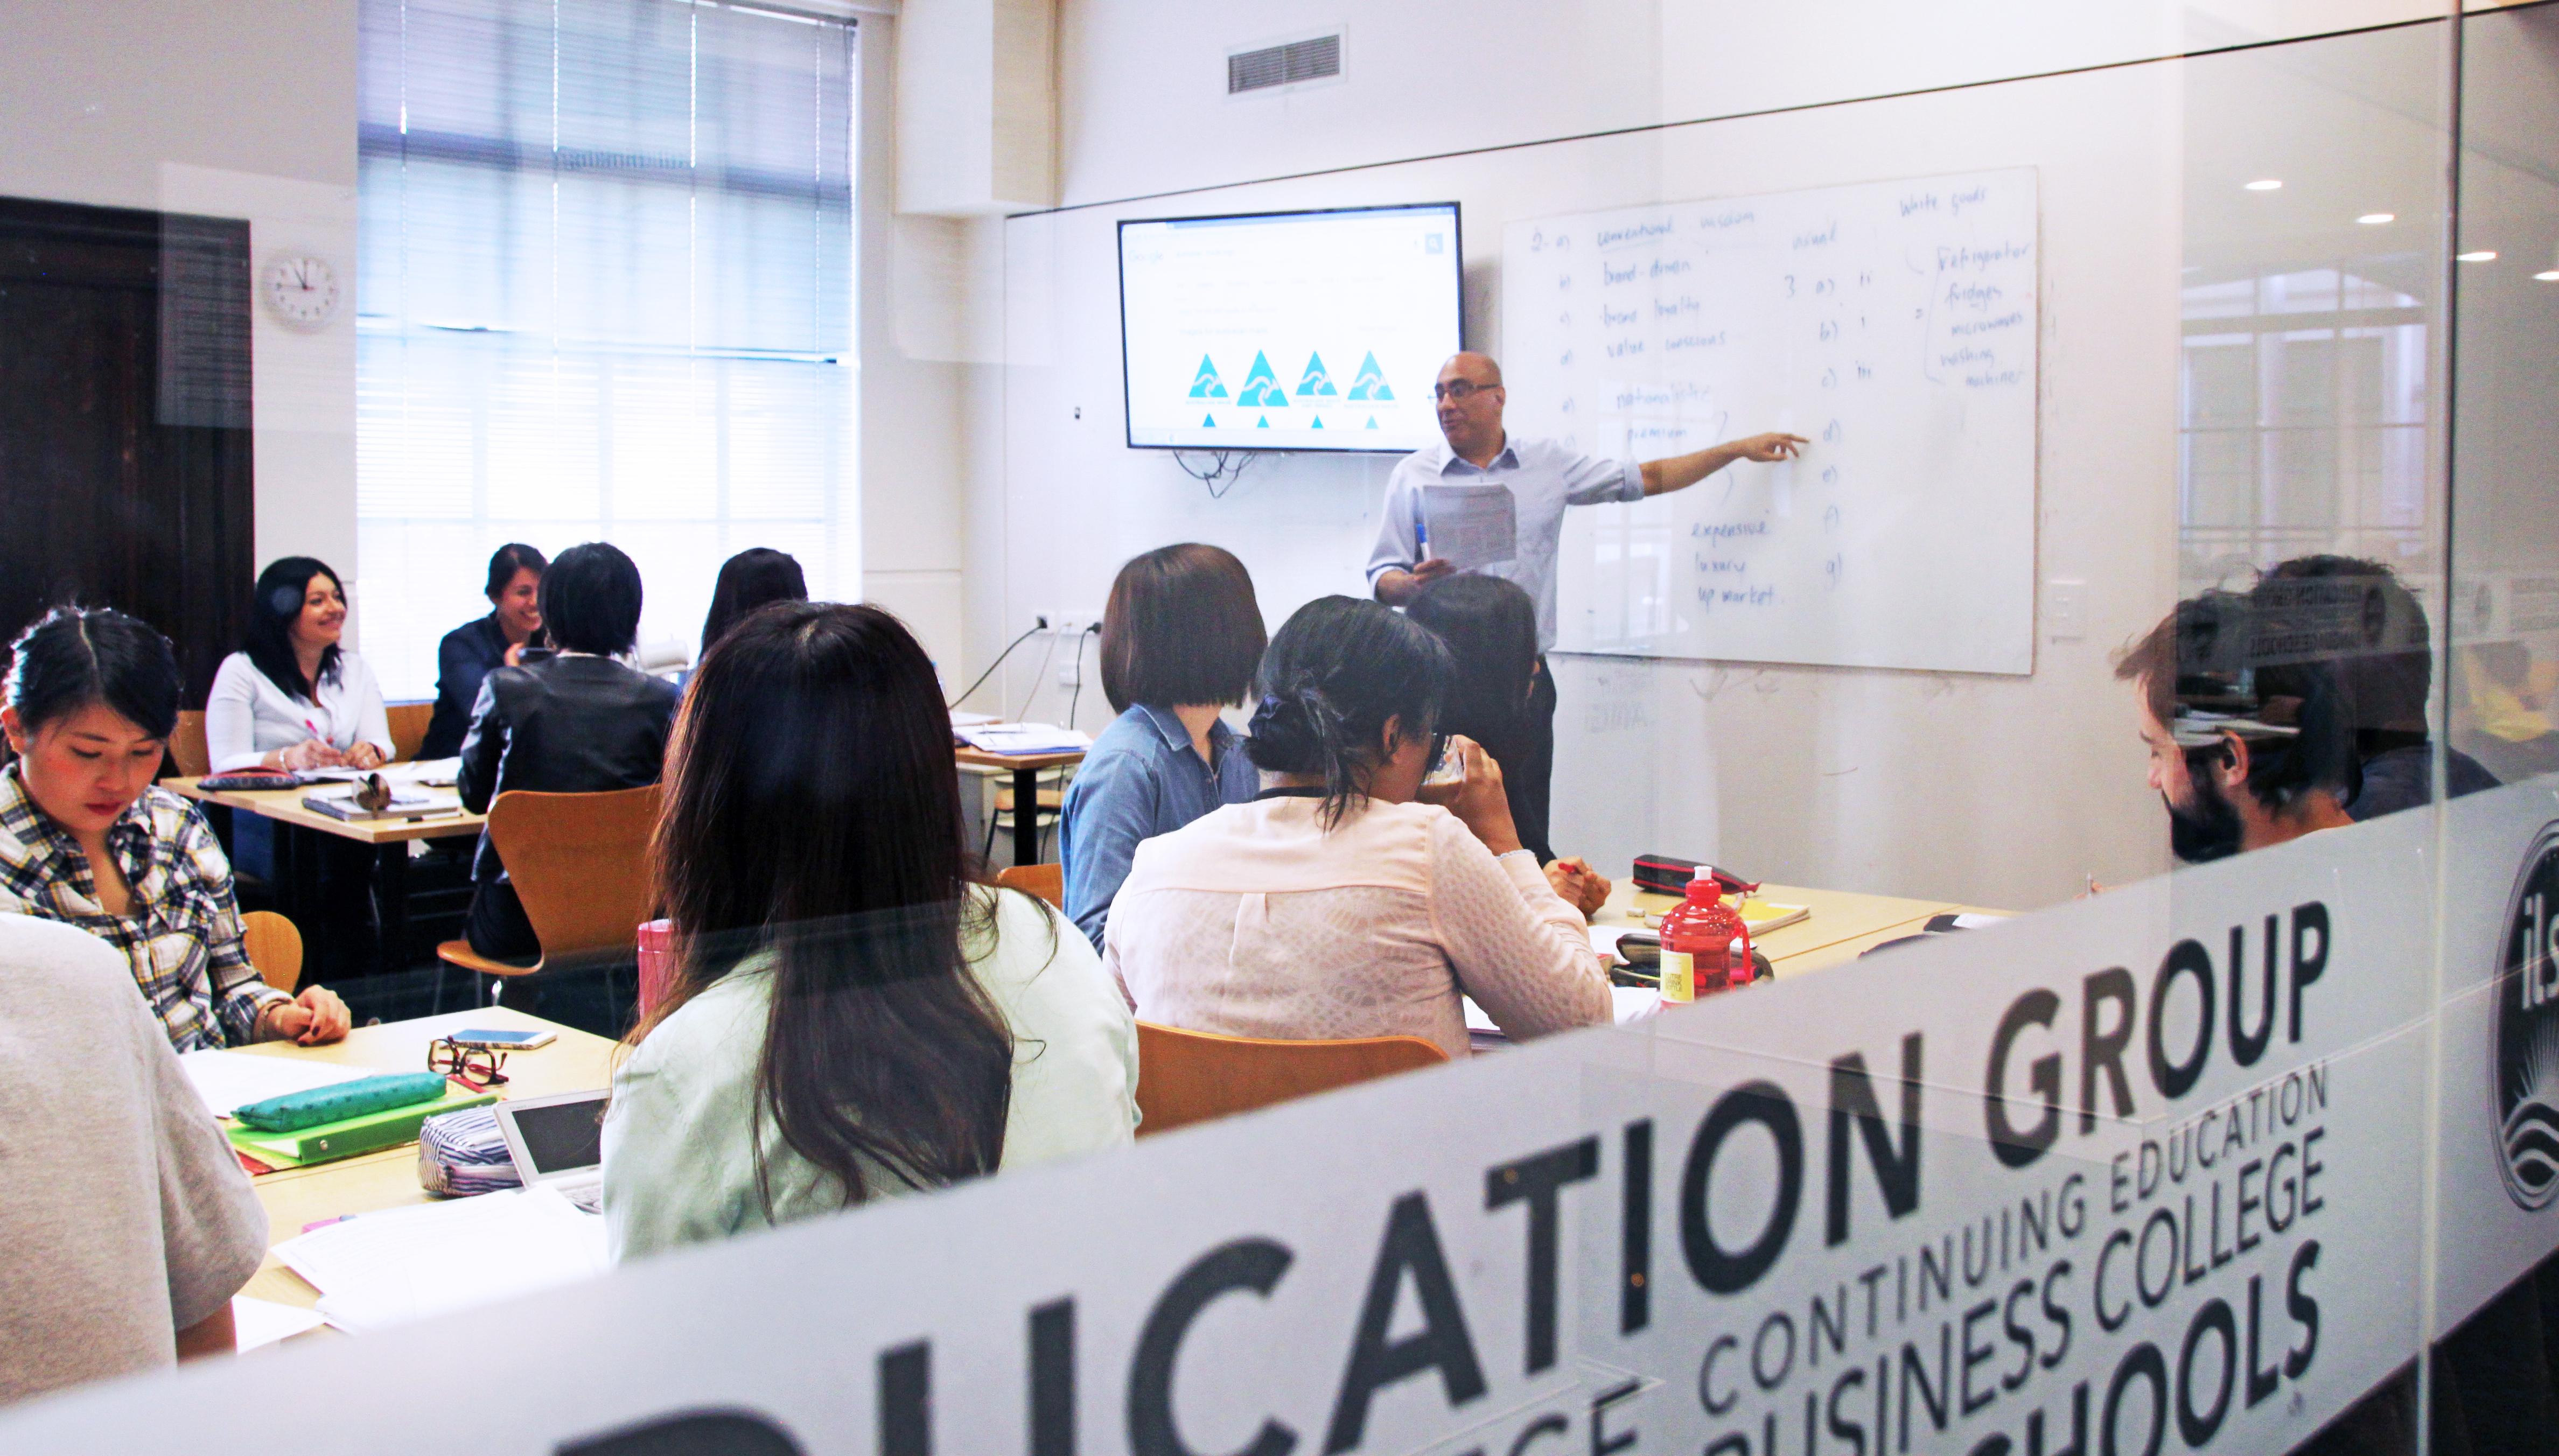 ilsc-brisbane-campus-classroom-2